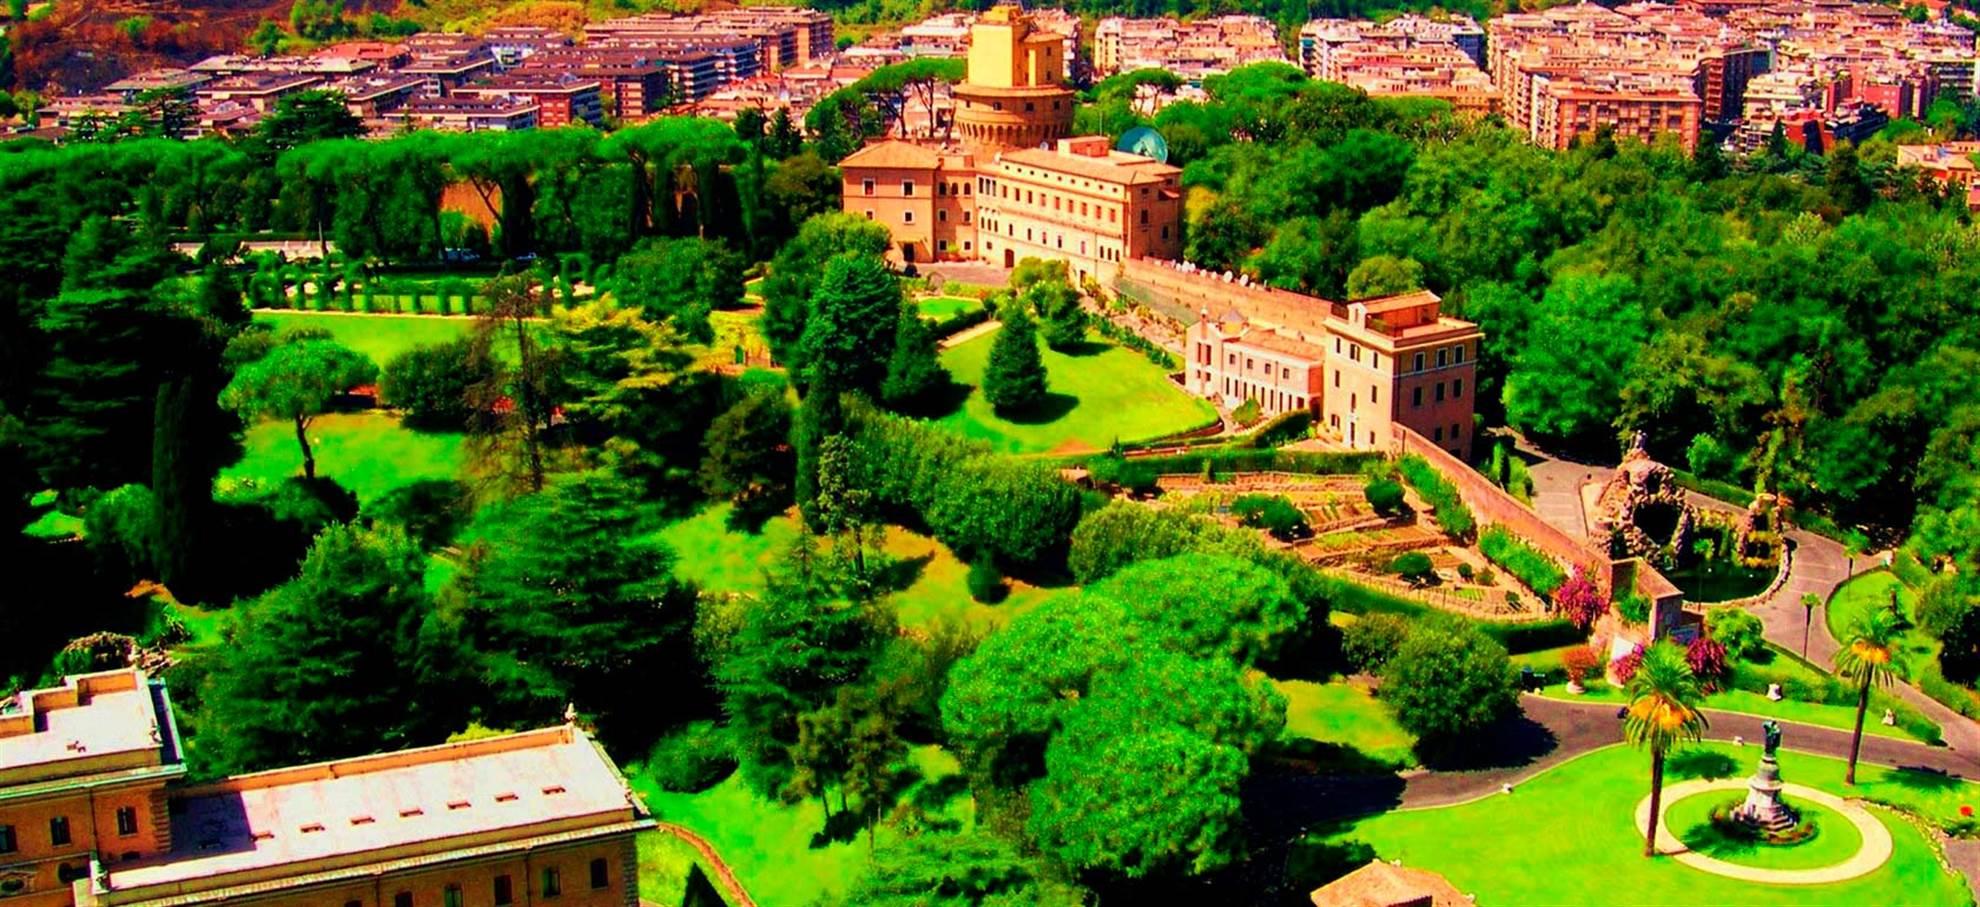 Сады Ватикана на автобусе